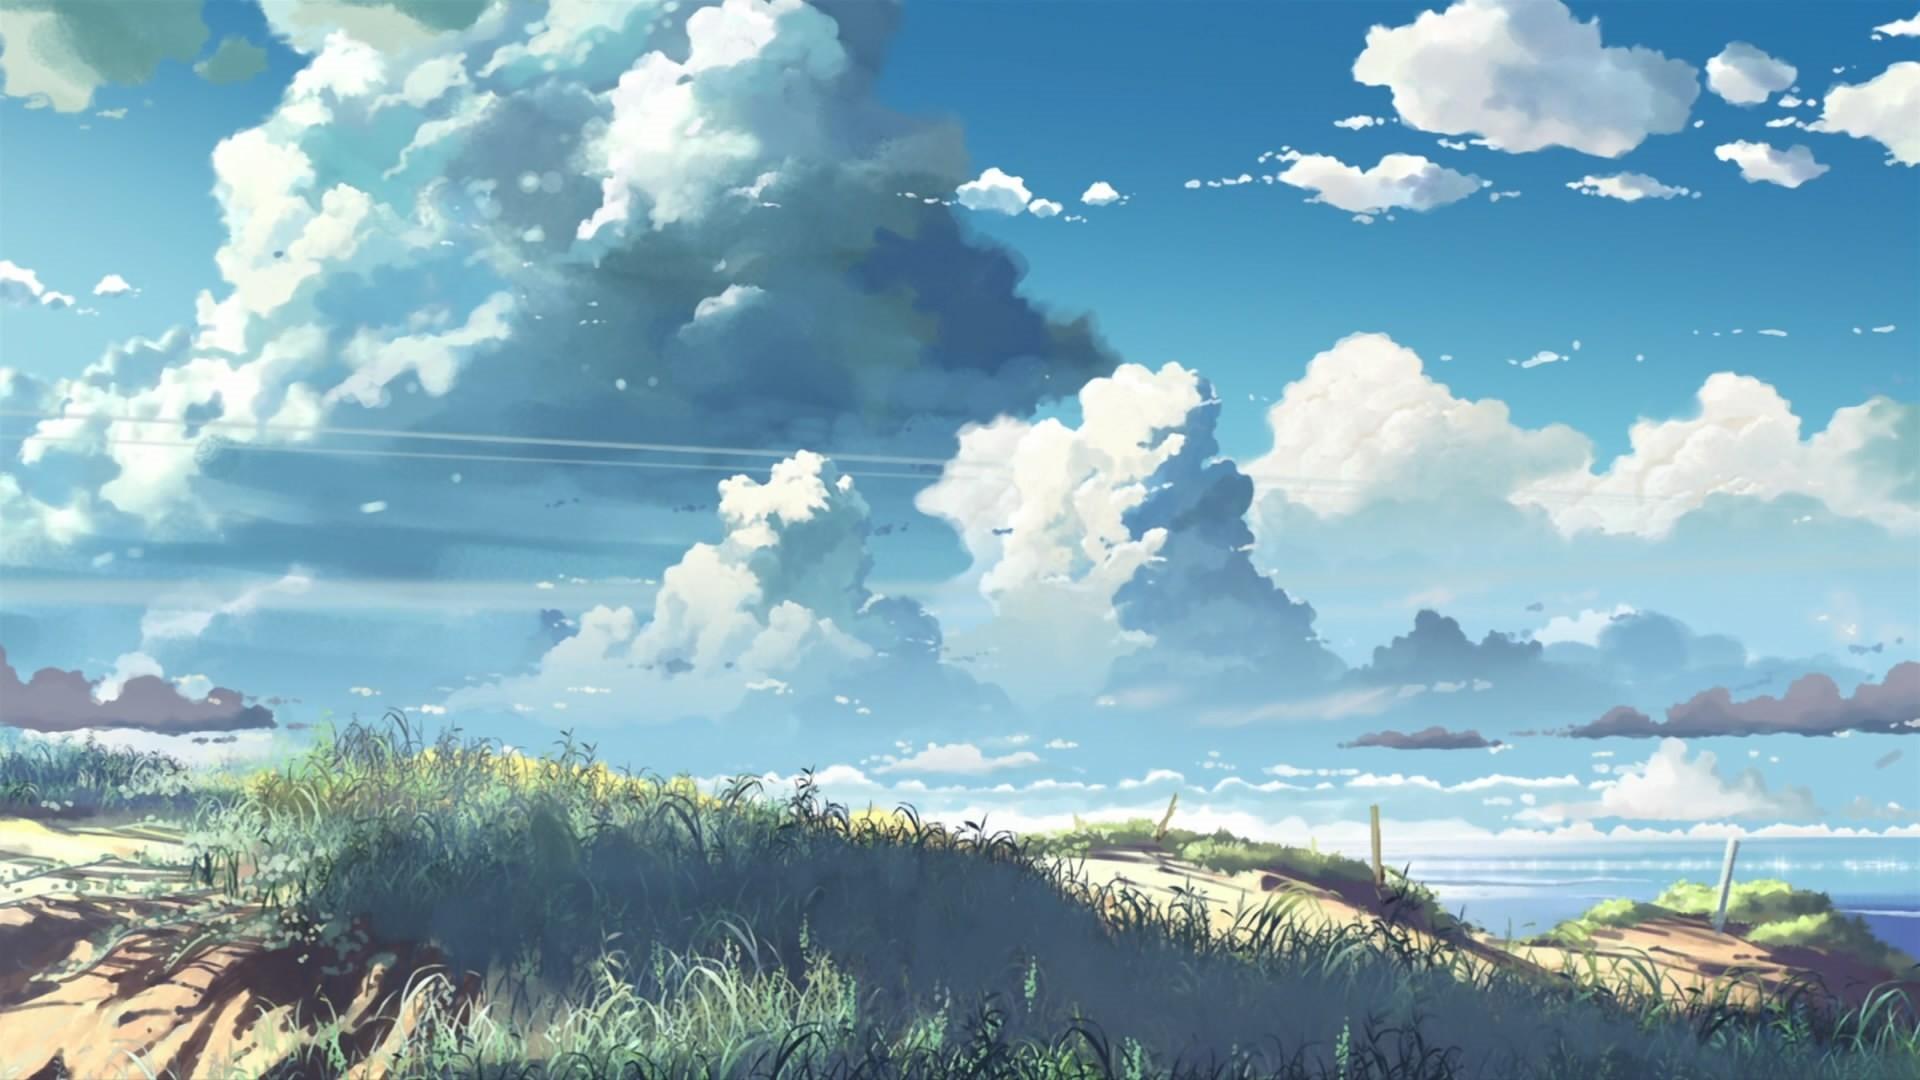 Anime Clouds hd desktop wallpaper